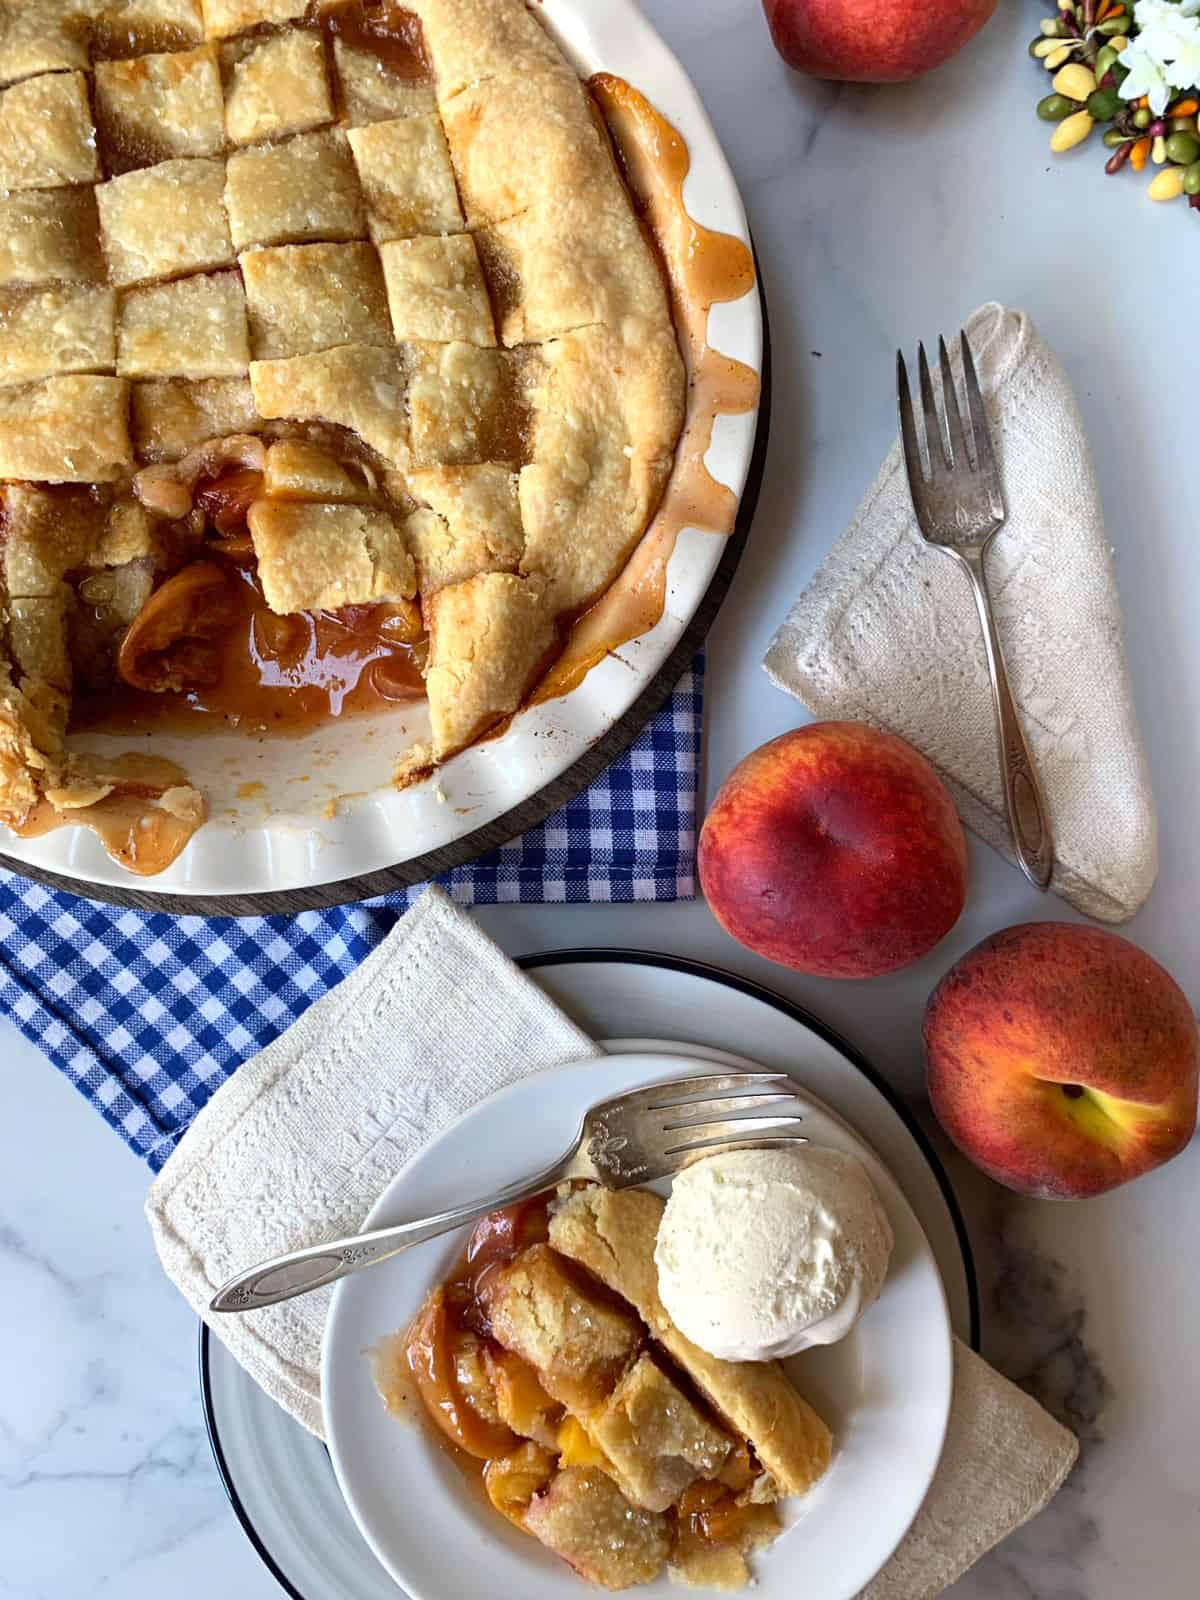 A peach pandowdy with ice cream.